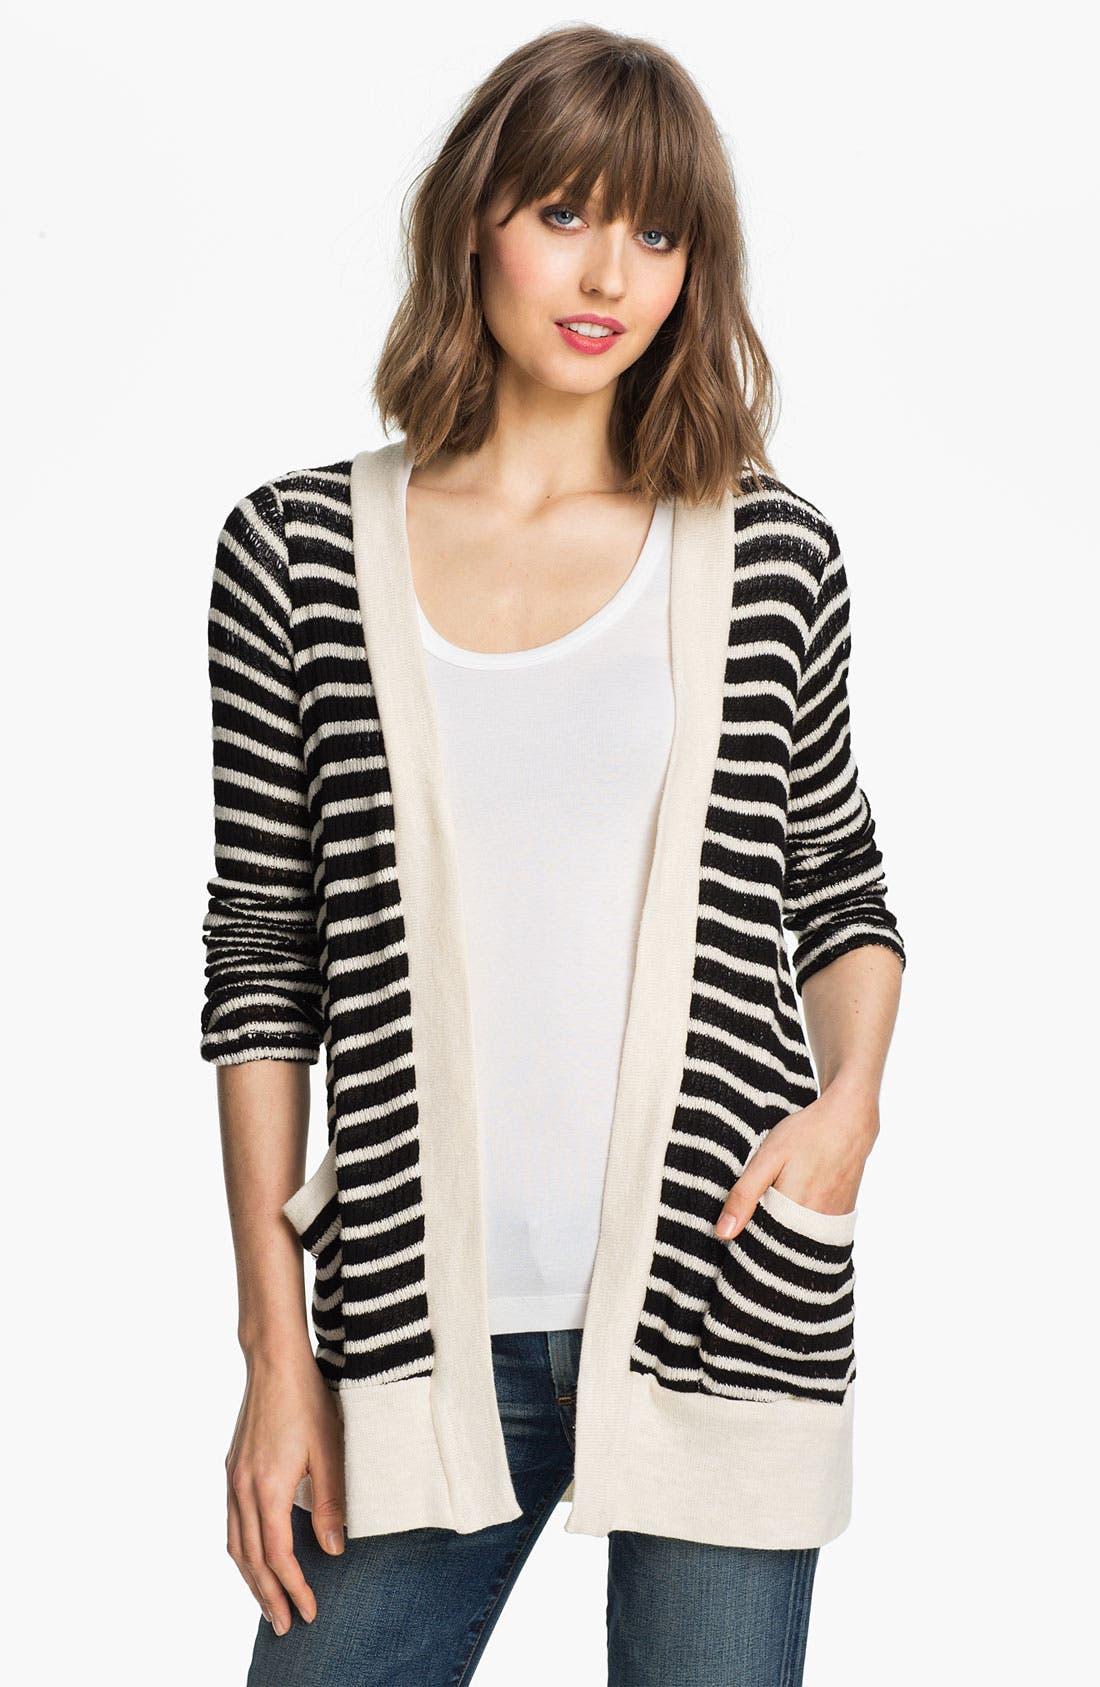 Main Image - Splendid 'Panama' Stripe Oversized Cardigan